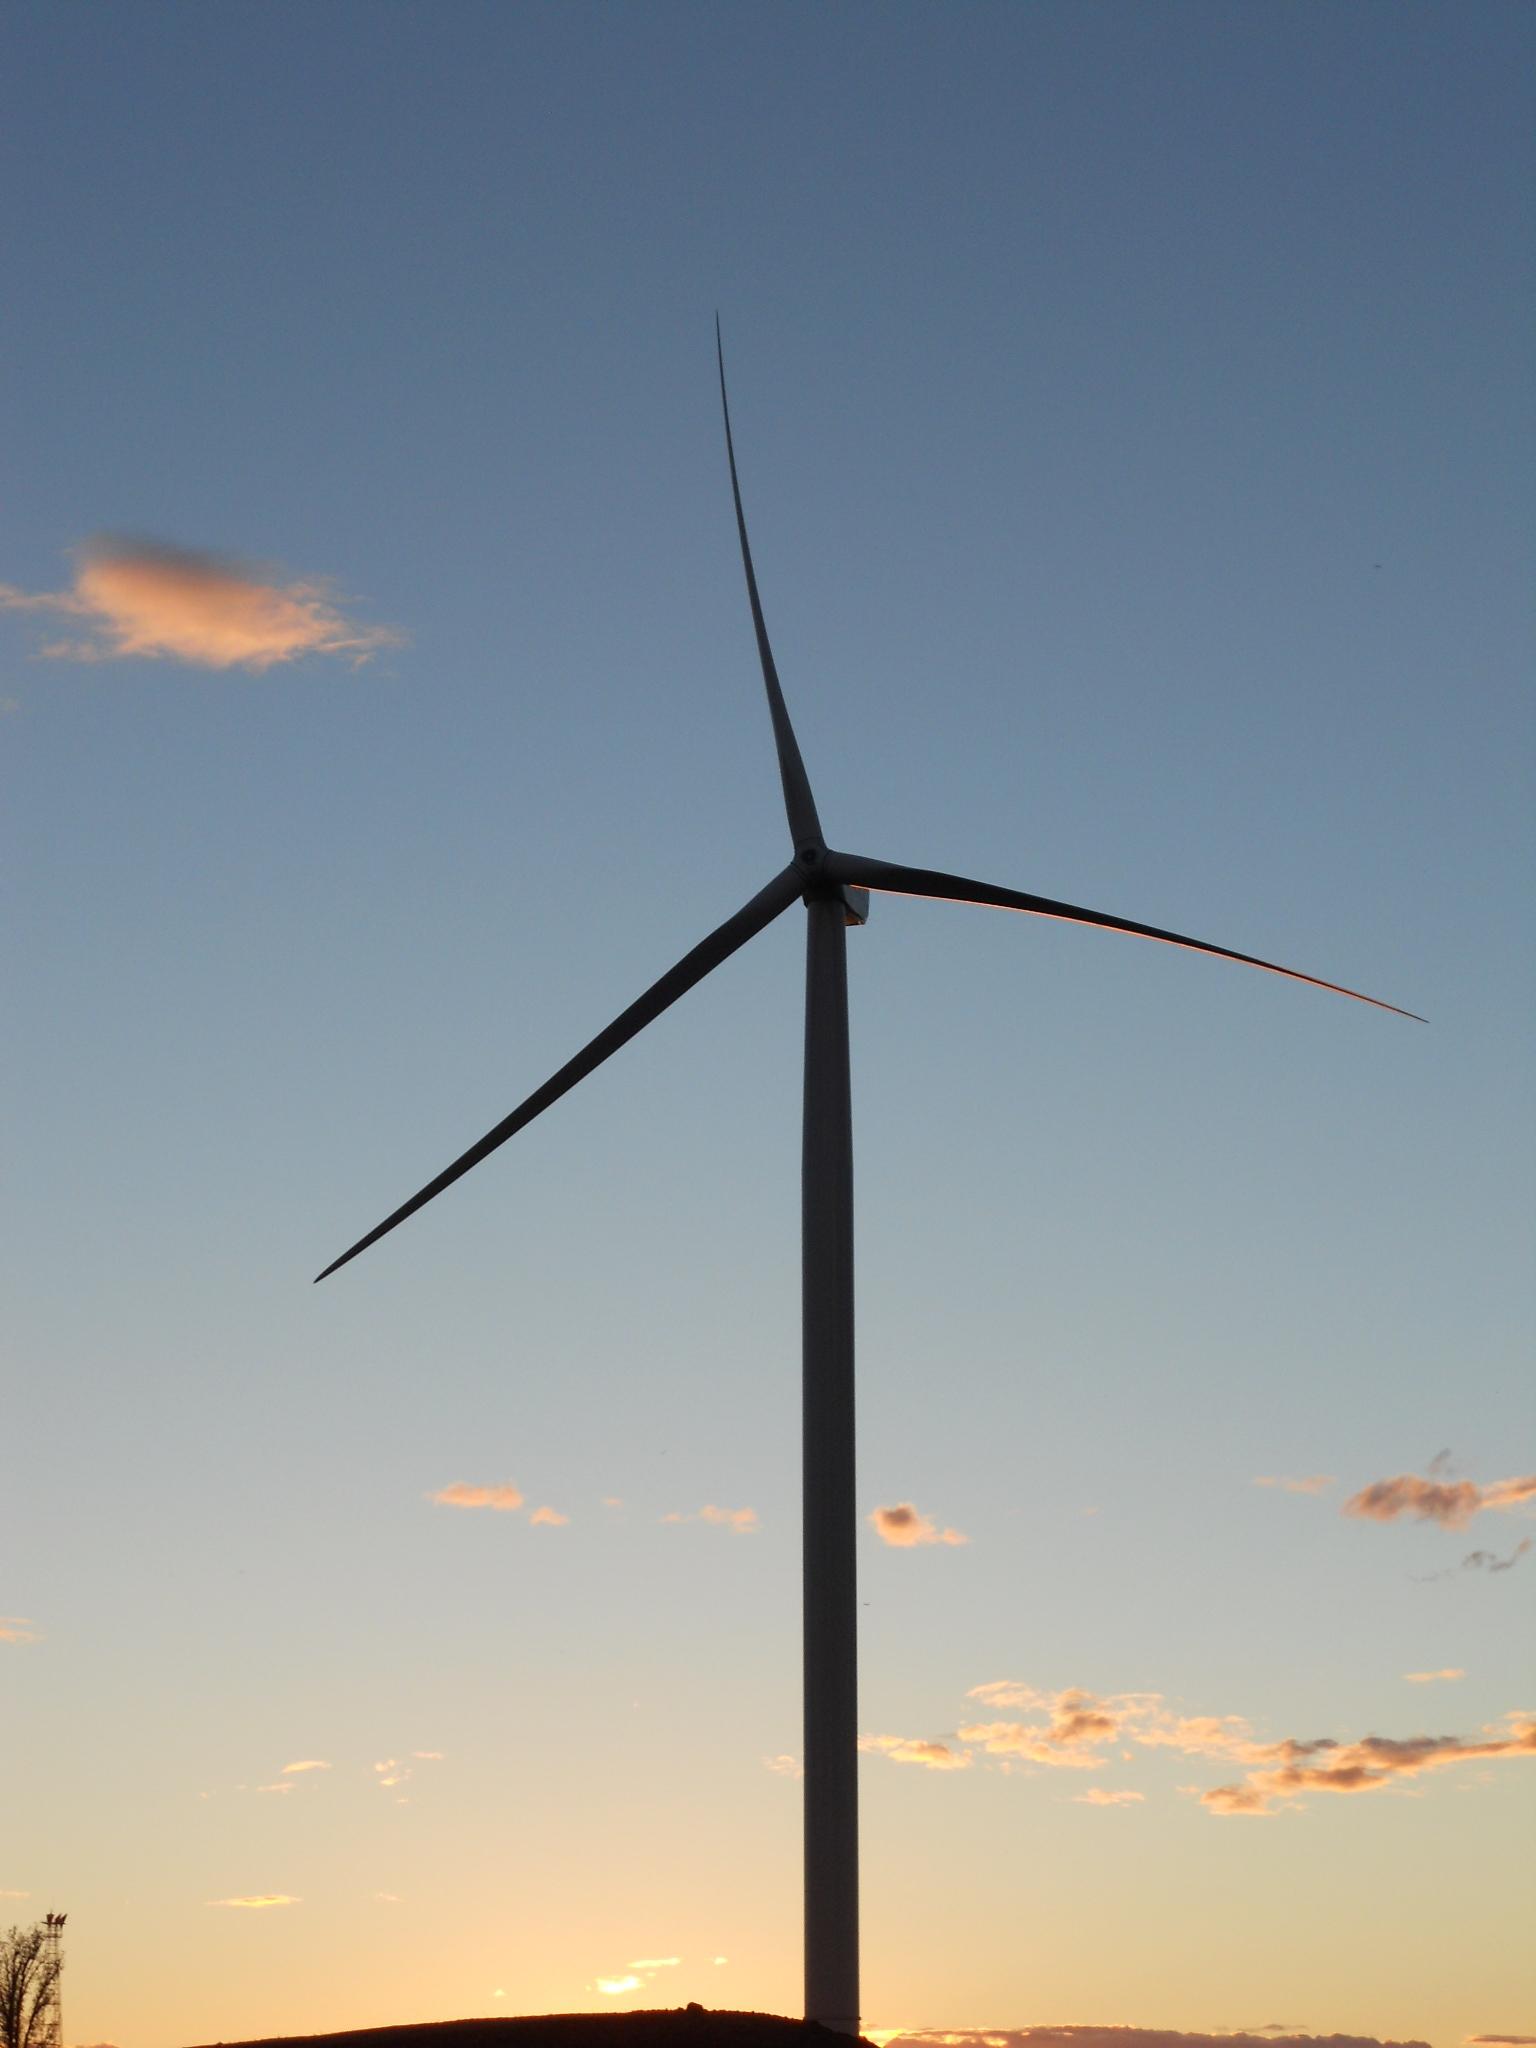 turbine photo2.JPG